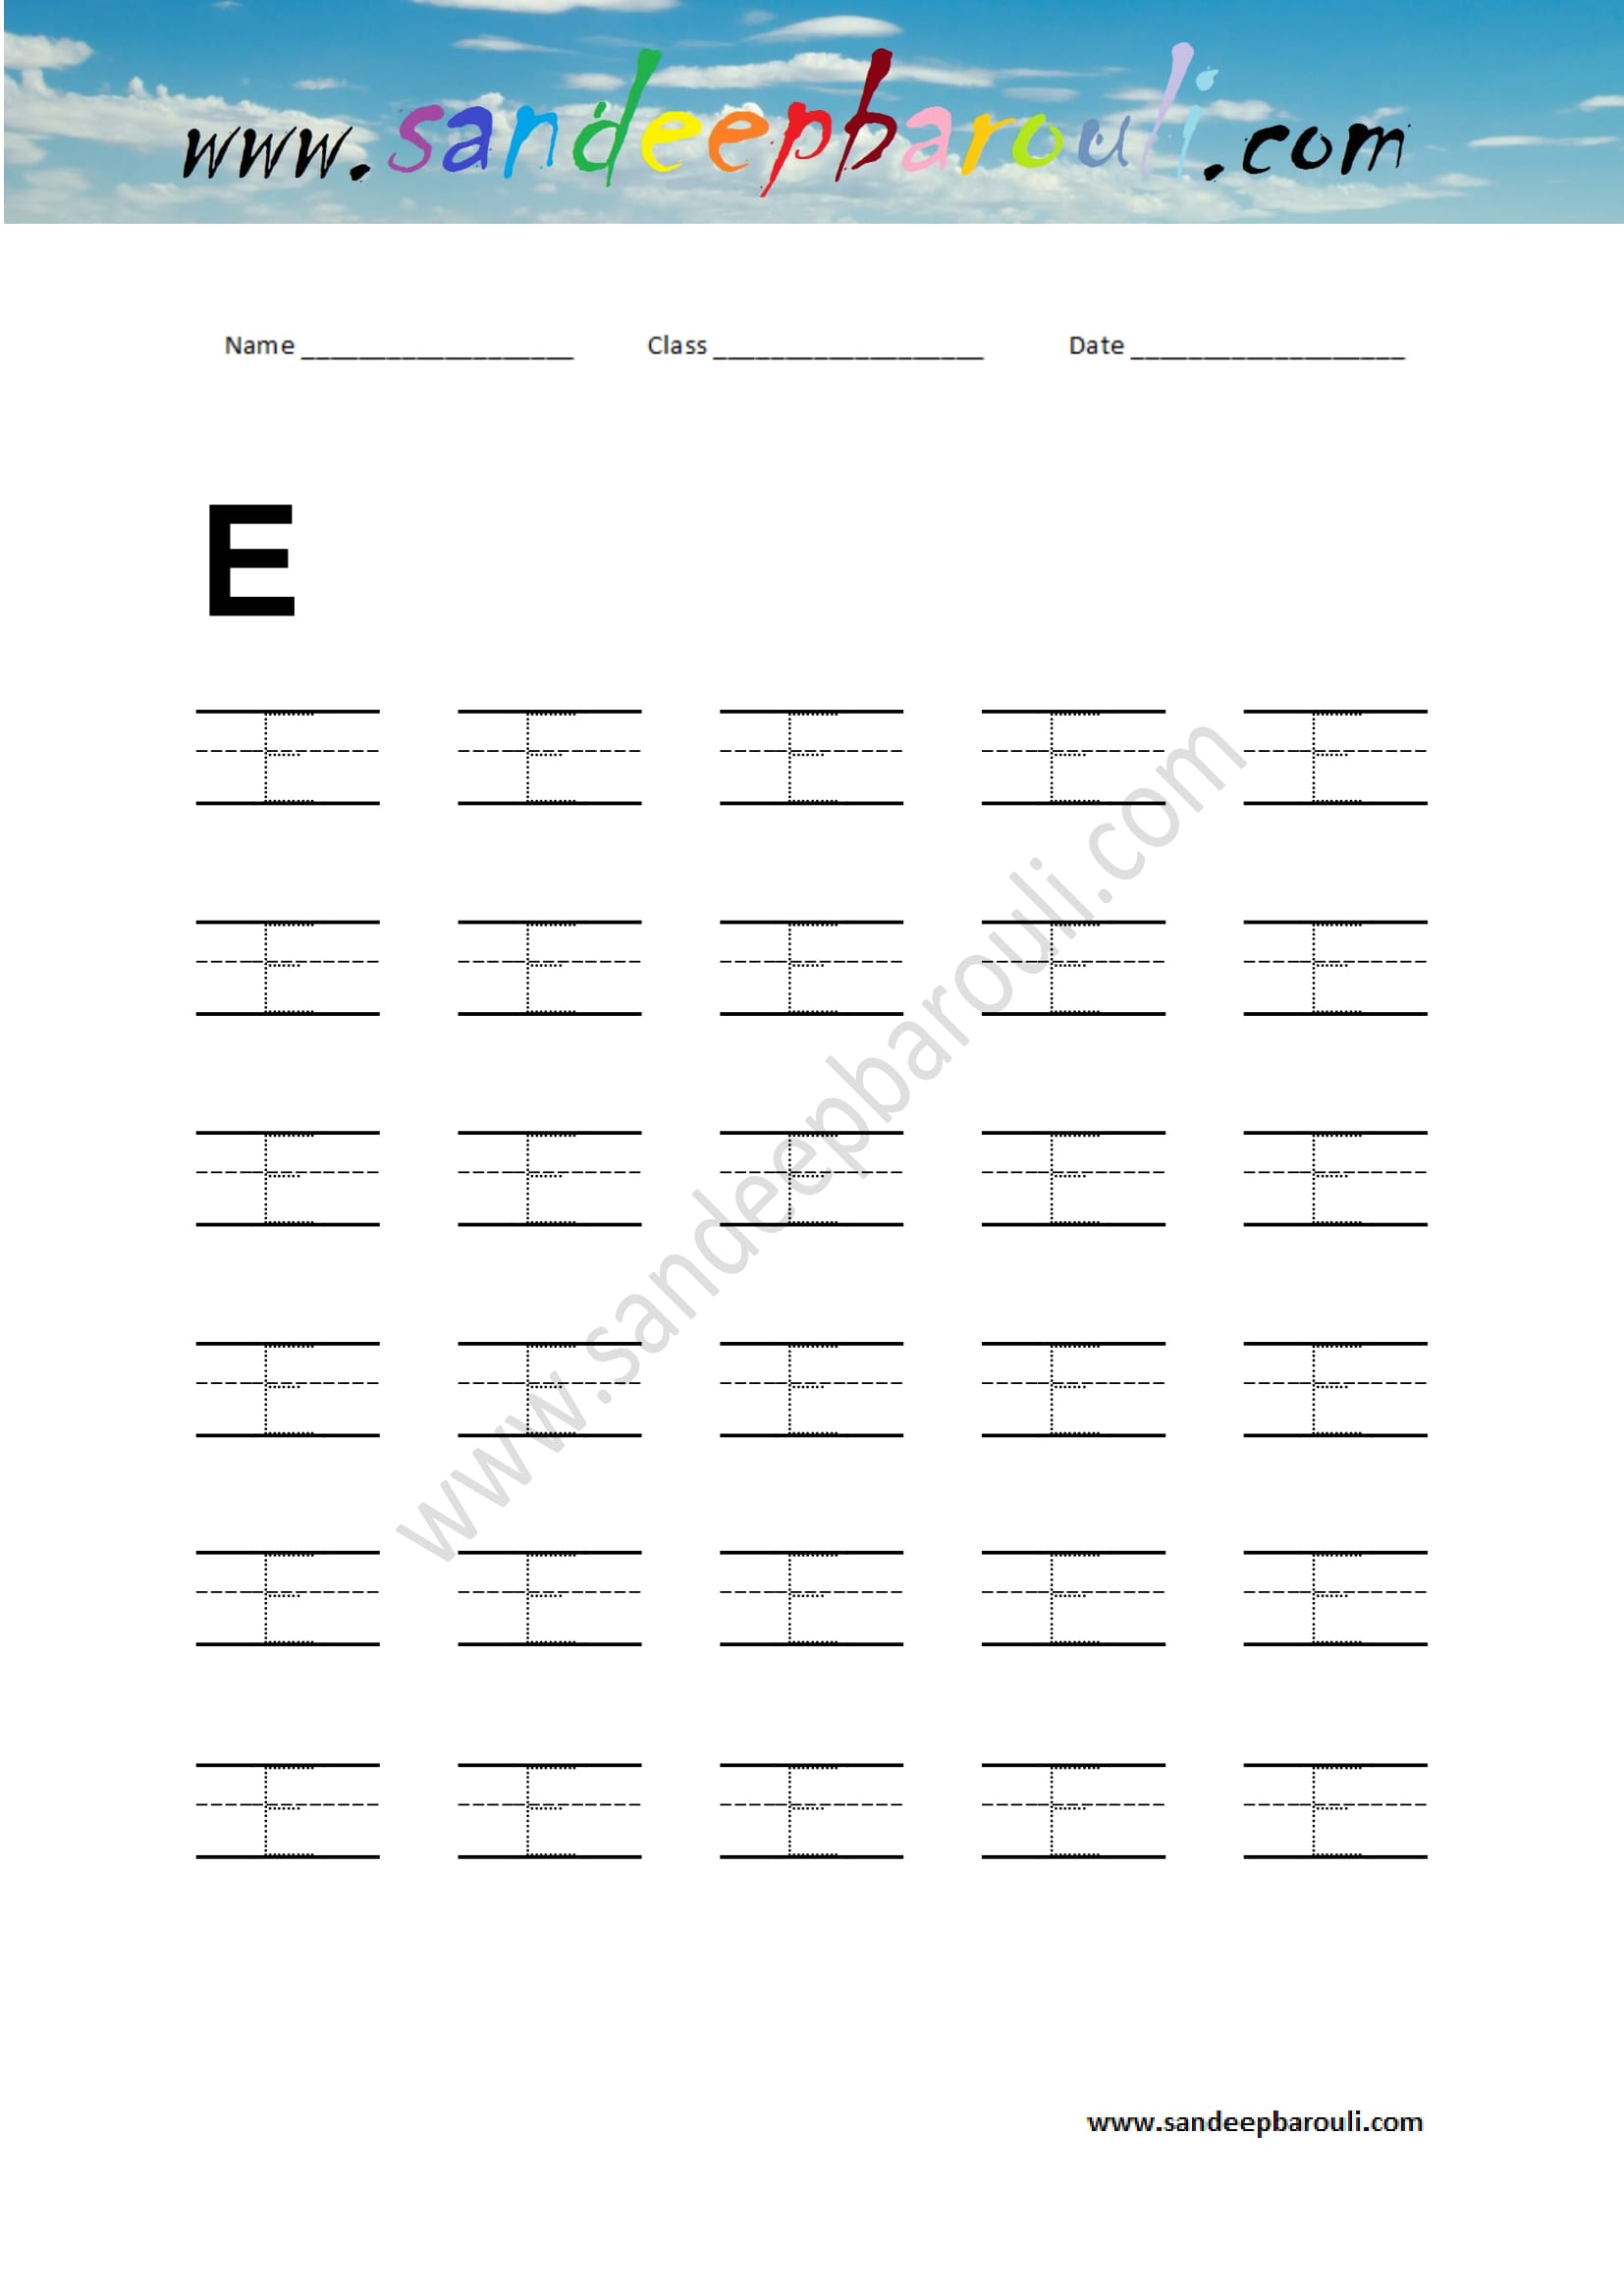 Handwriting Practice Letter E Sandeepbarouli